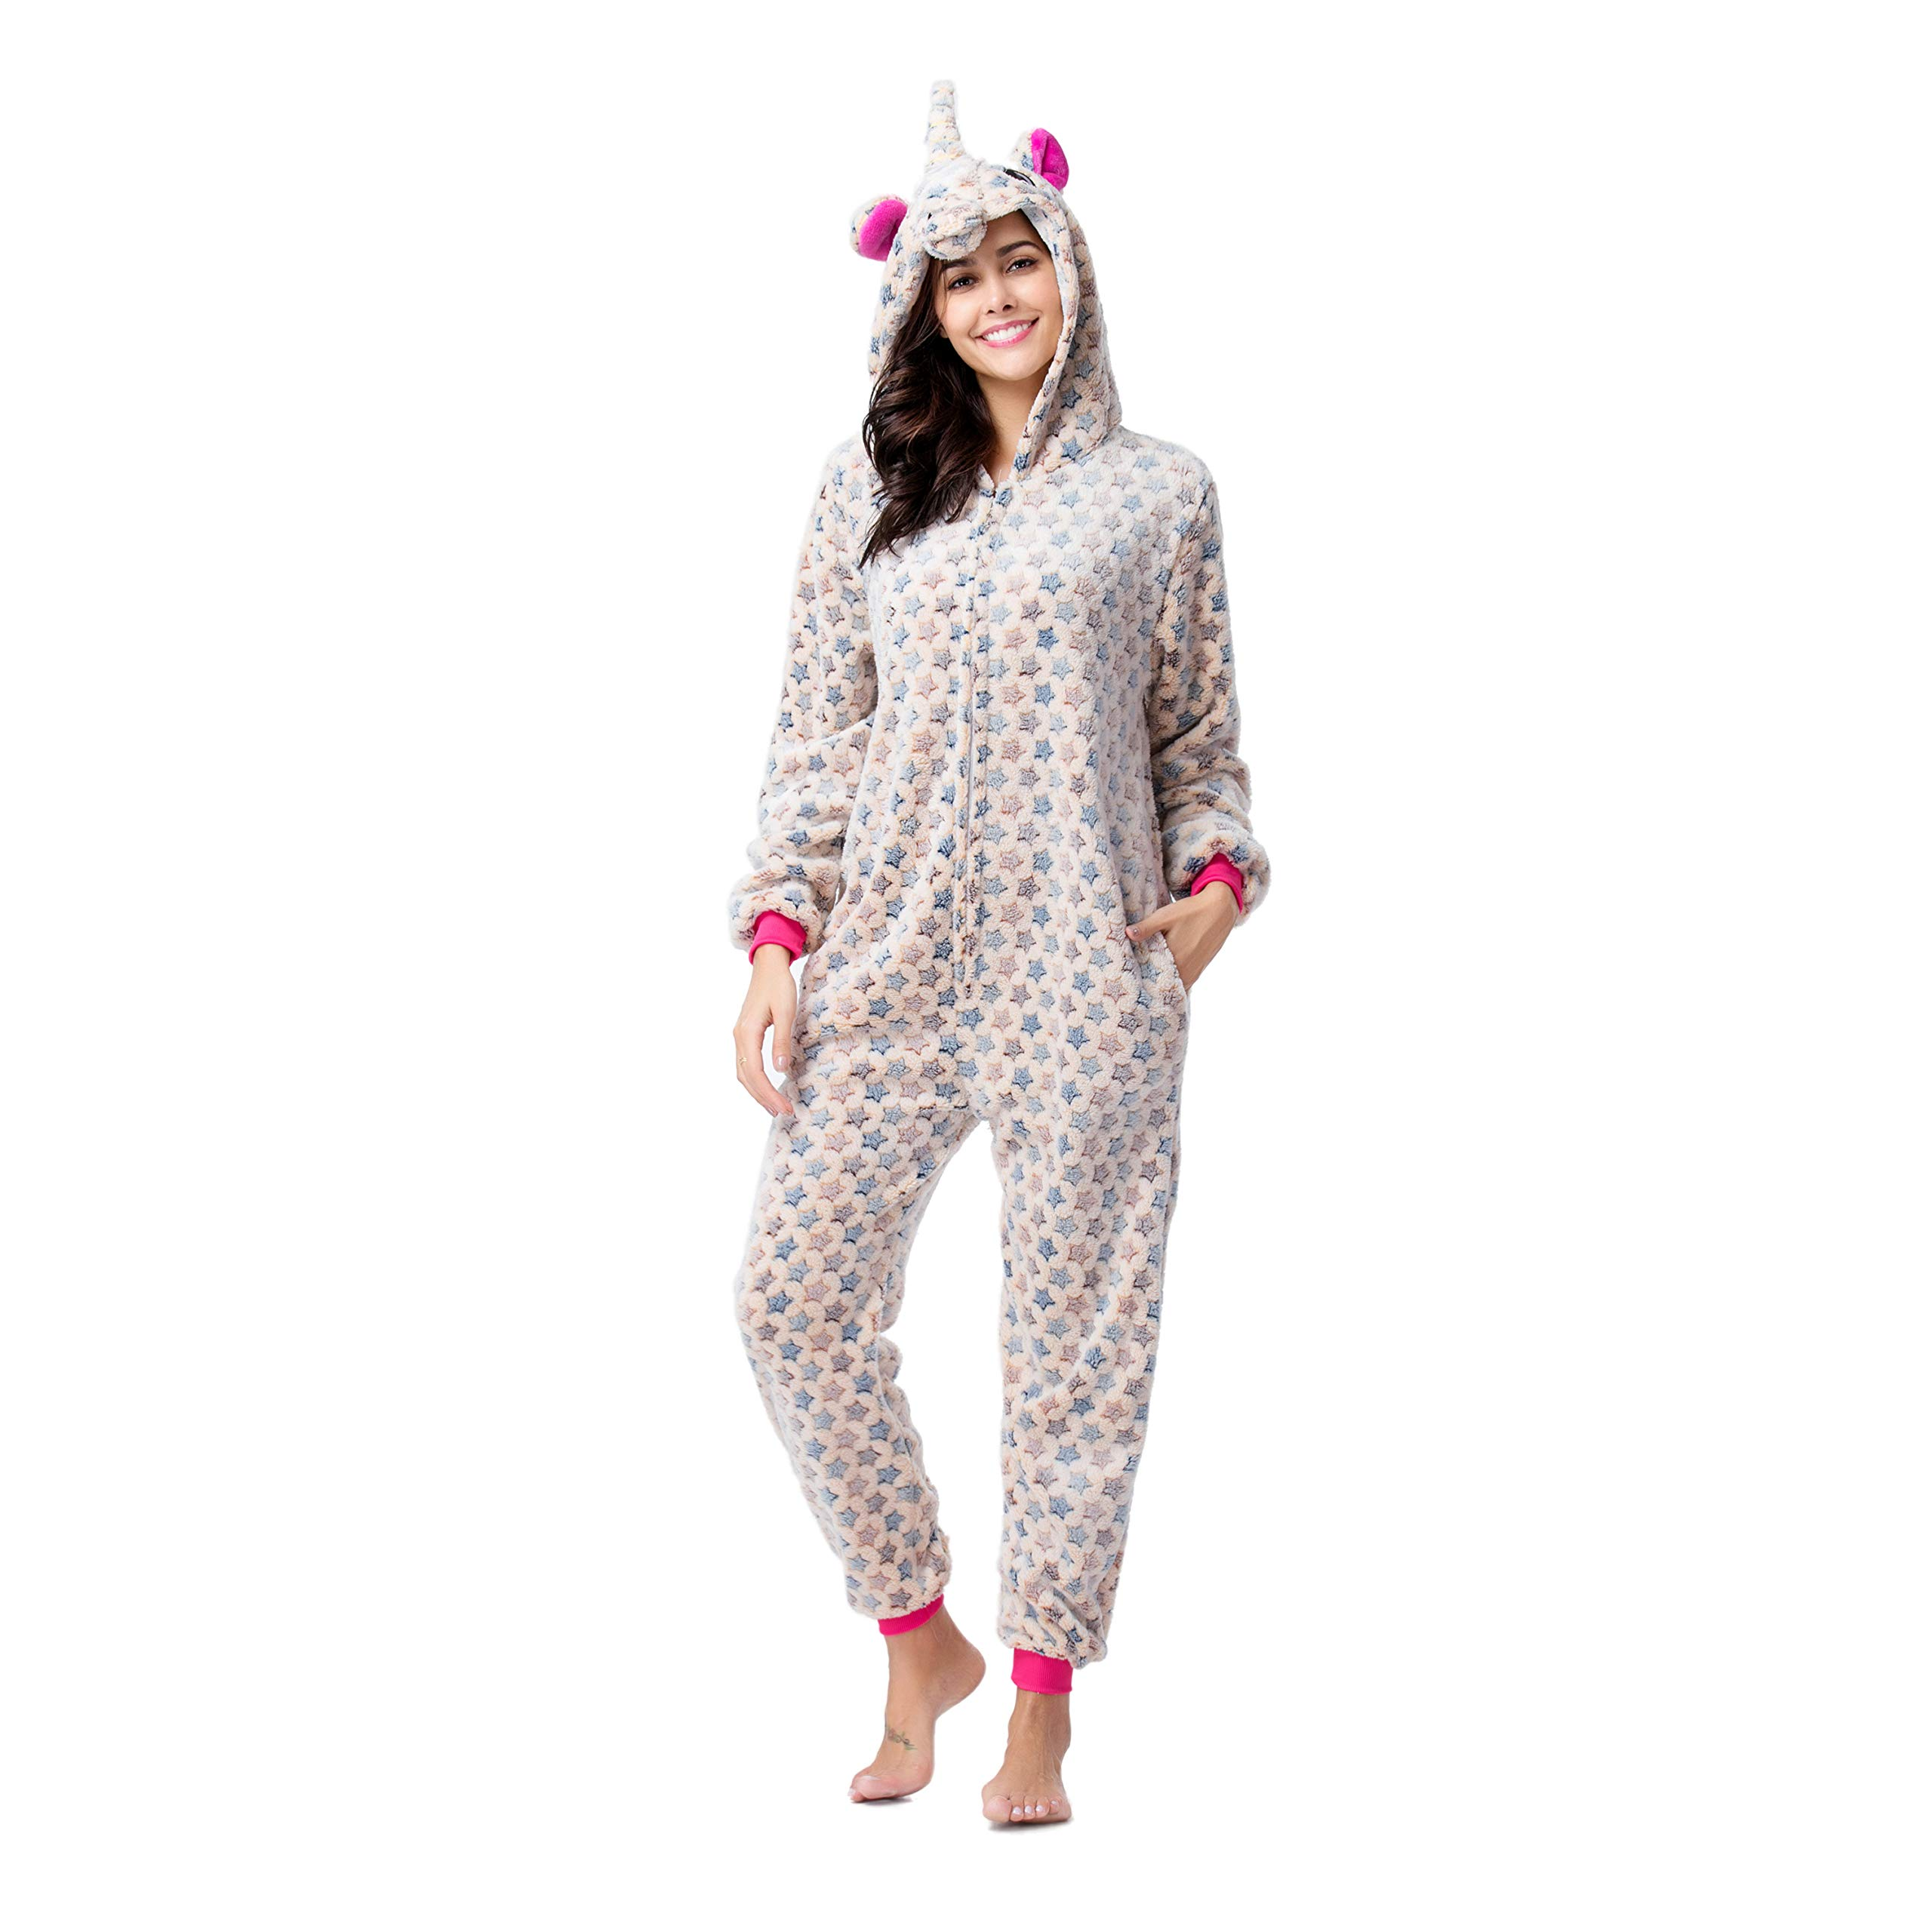 RONGTAI Adults Unisex Animal Flannel Unicorn Onesie Pajamas Cosplay Costume